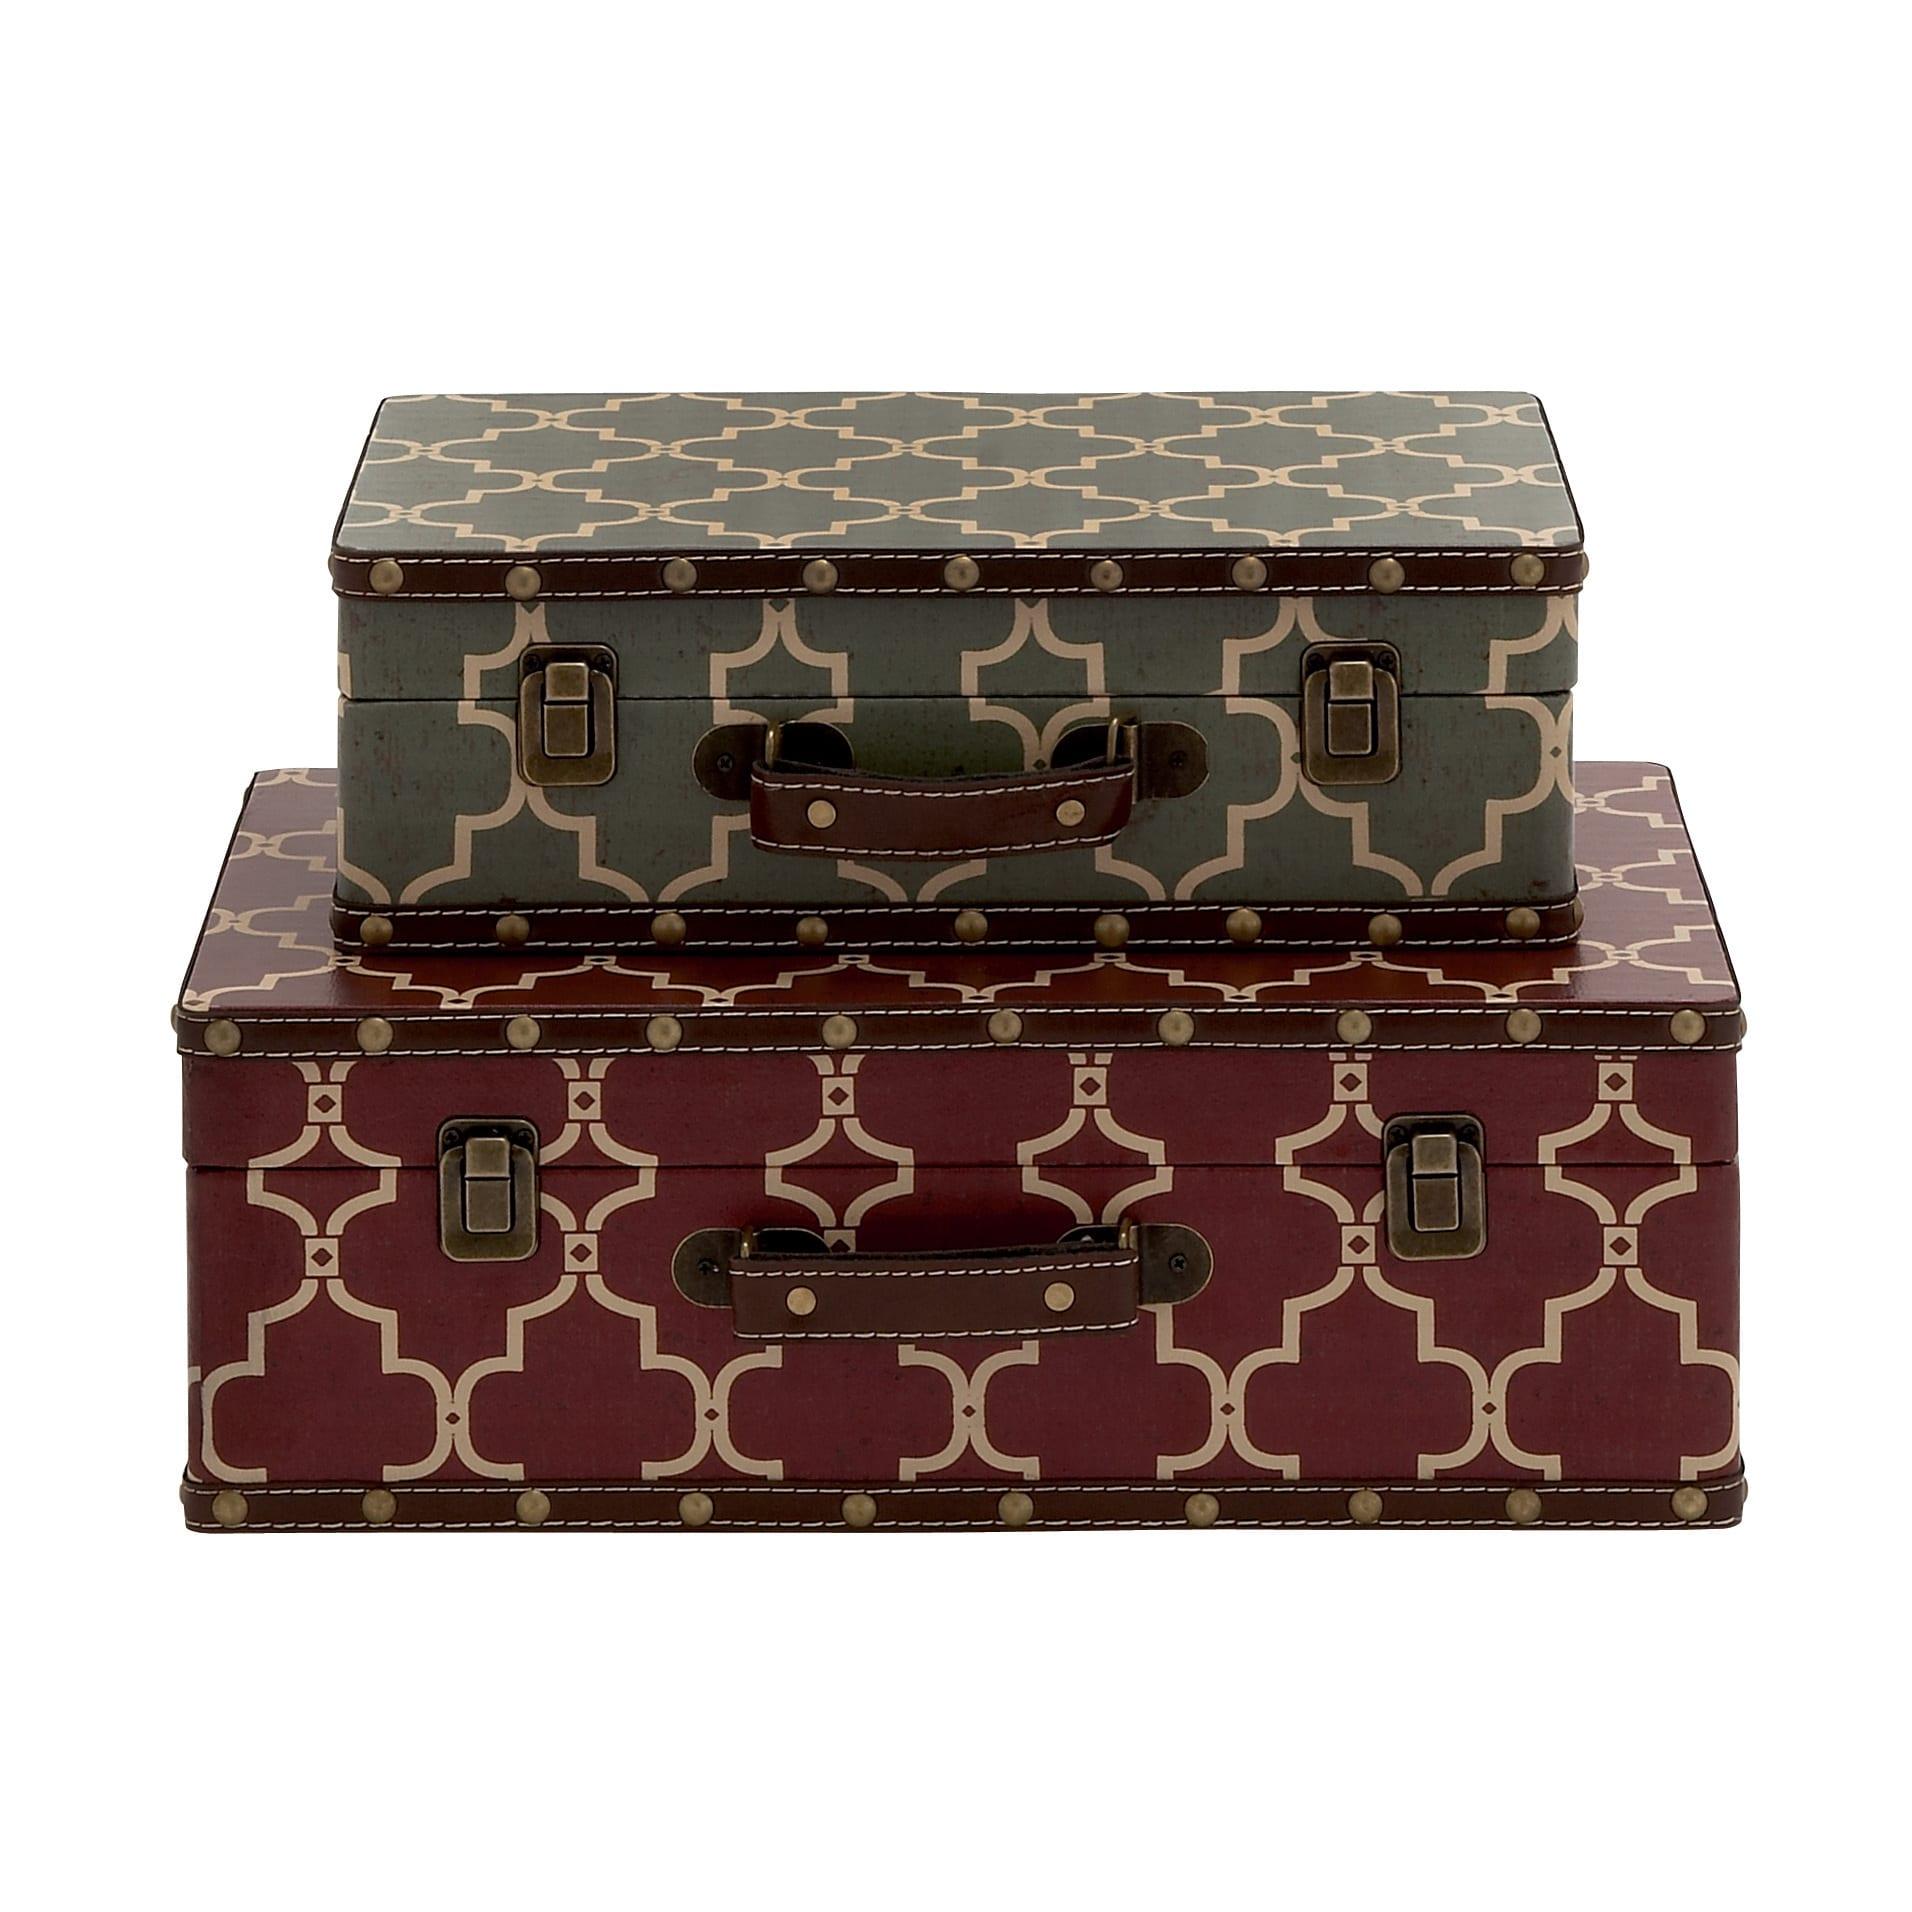 Elegant And Vintage Themed Wood Vinyl Case (Set Of 2)